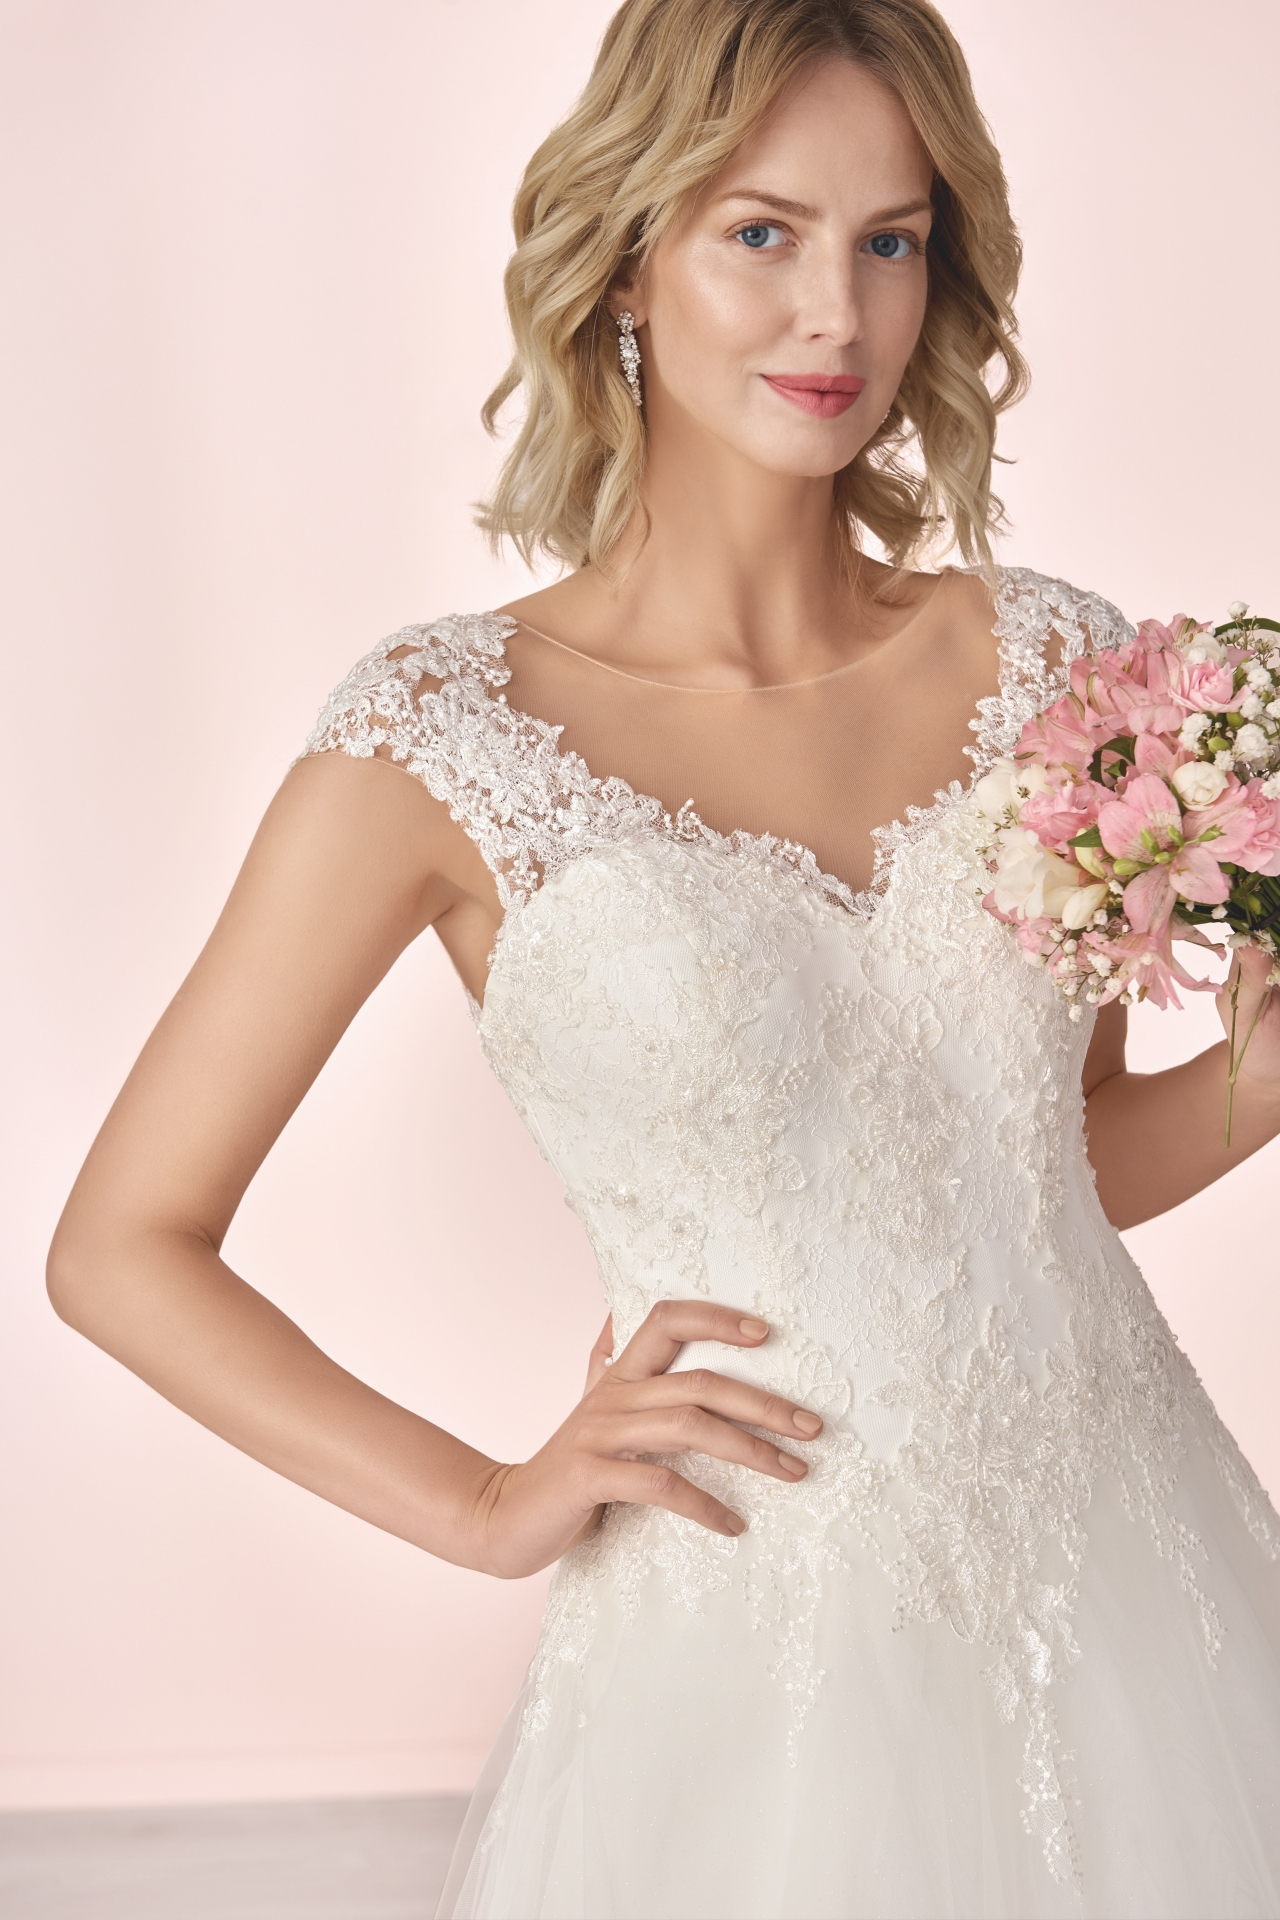 Brautkleid Elizabeth Konin 2019 - 4146T-0